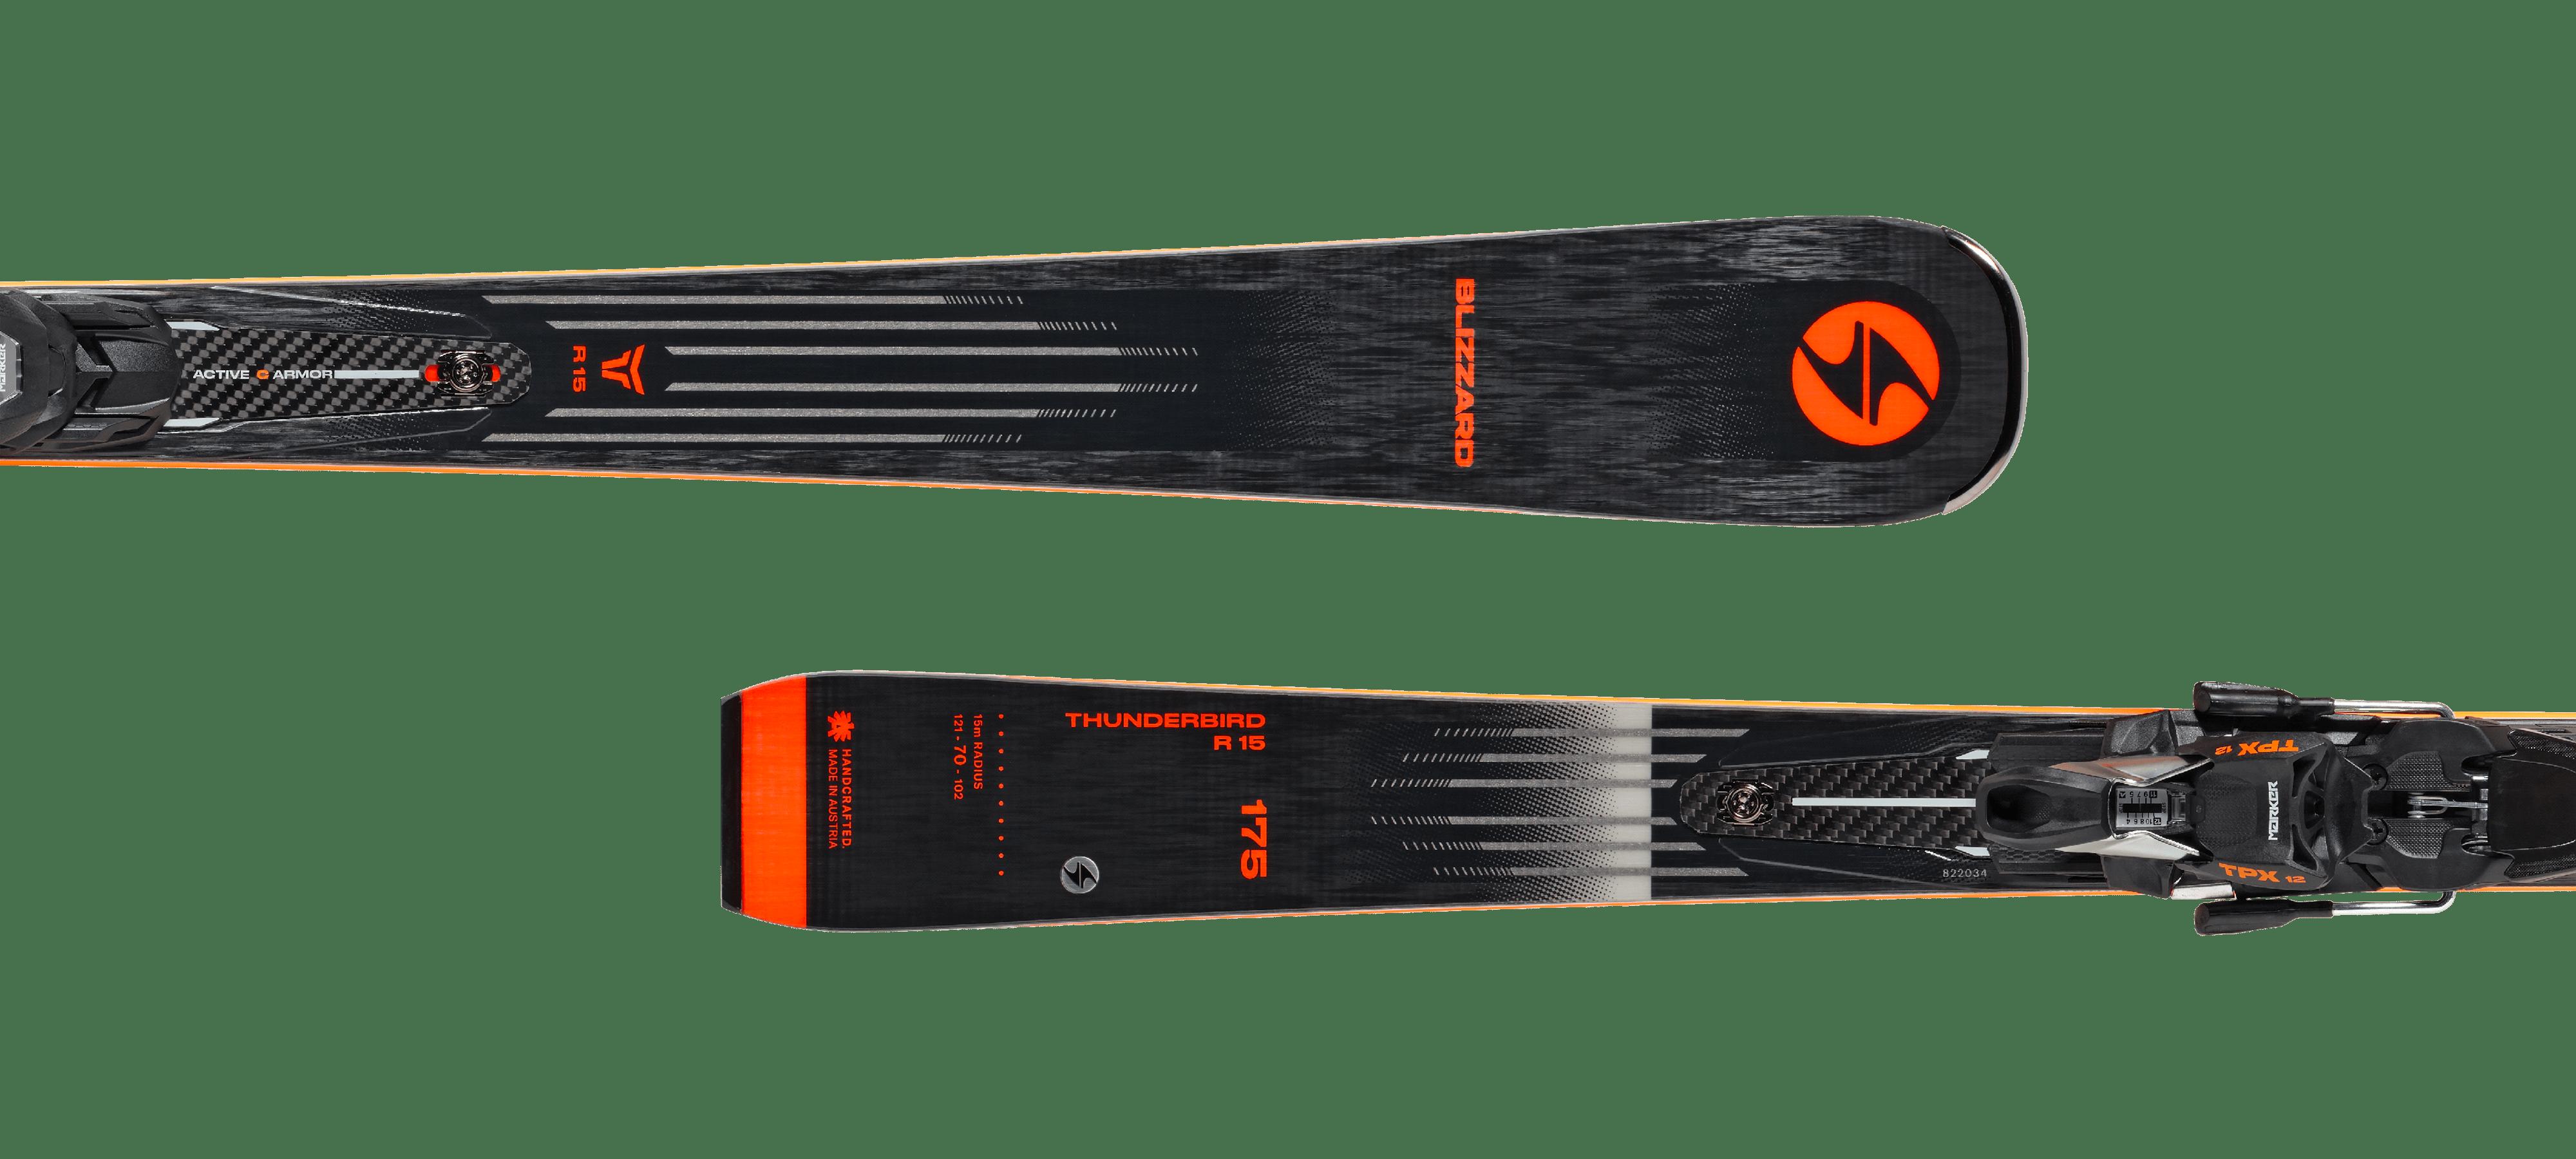 BLIZZARD THUNDERBIRD R15 + TPX 12 DEMO